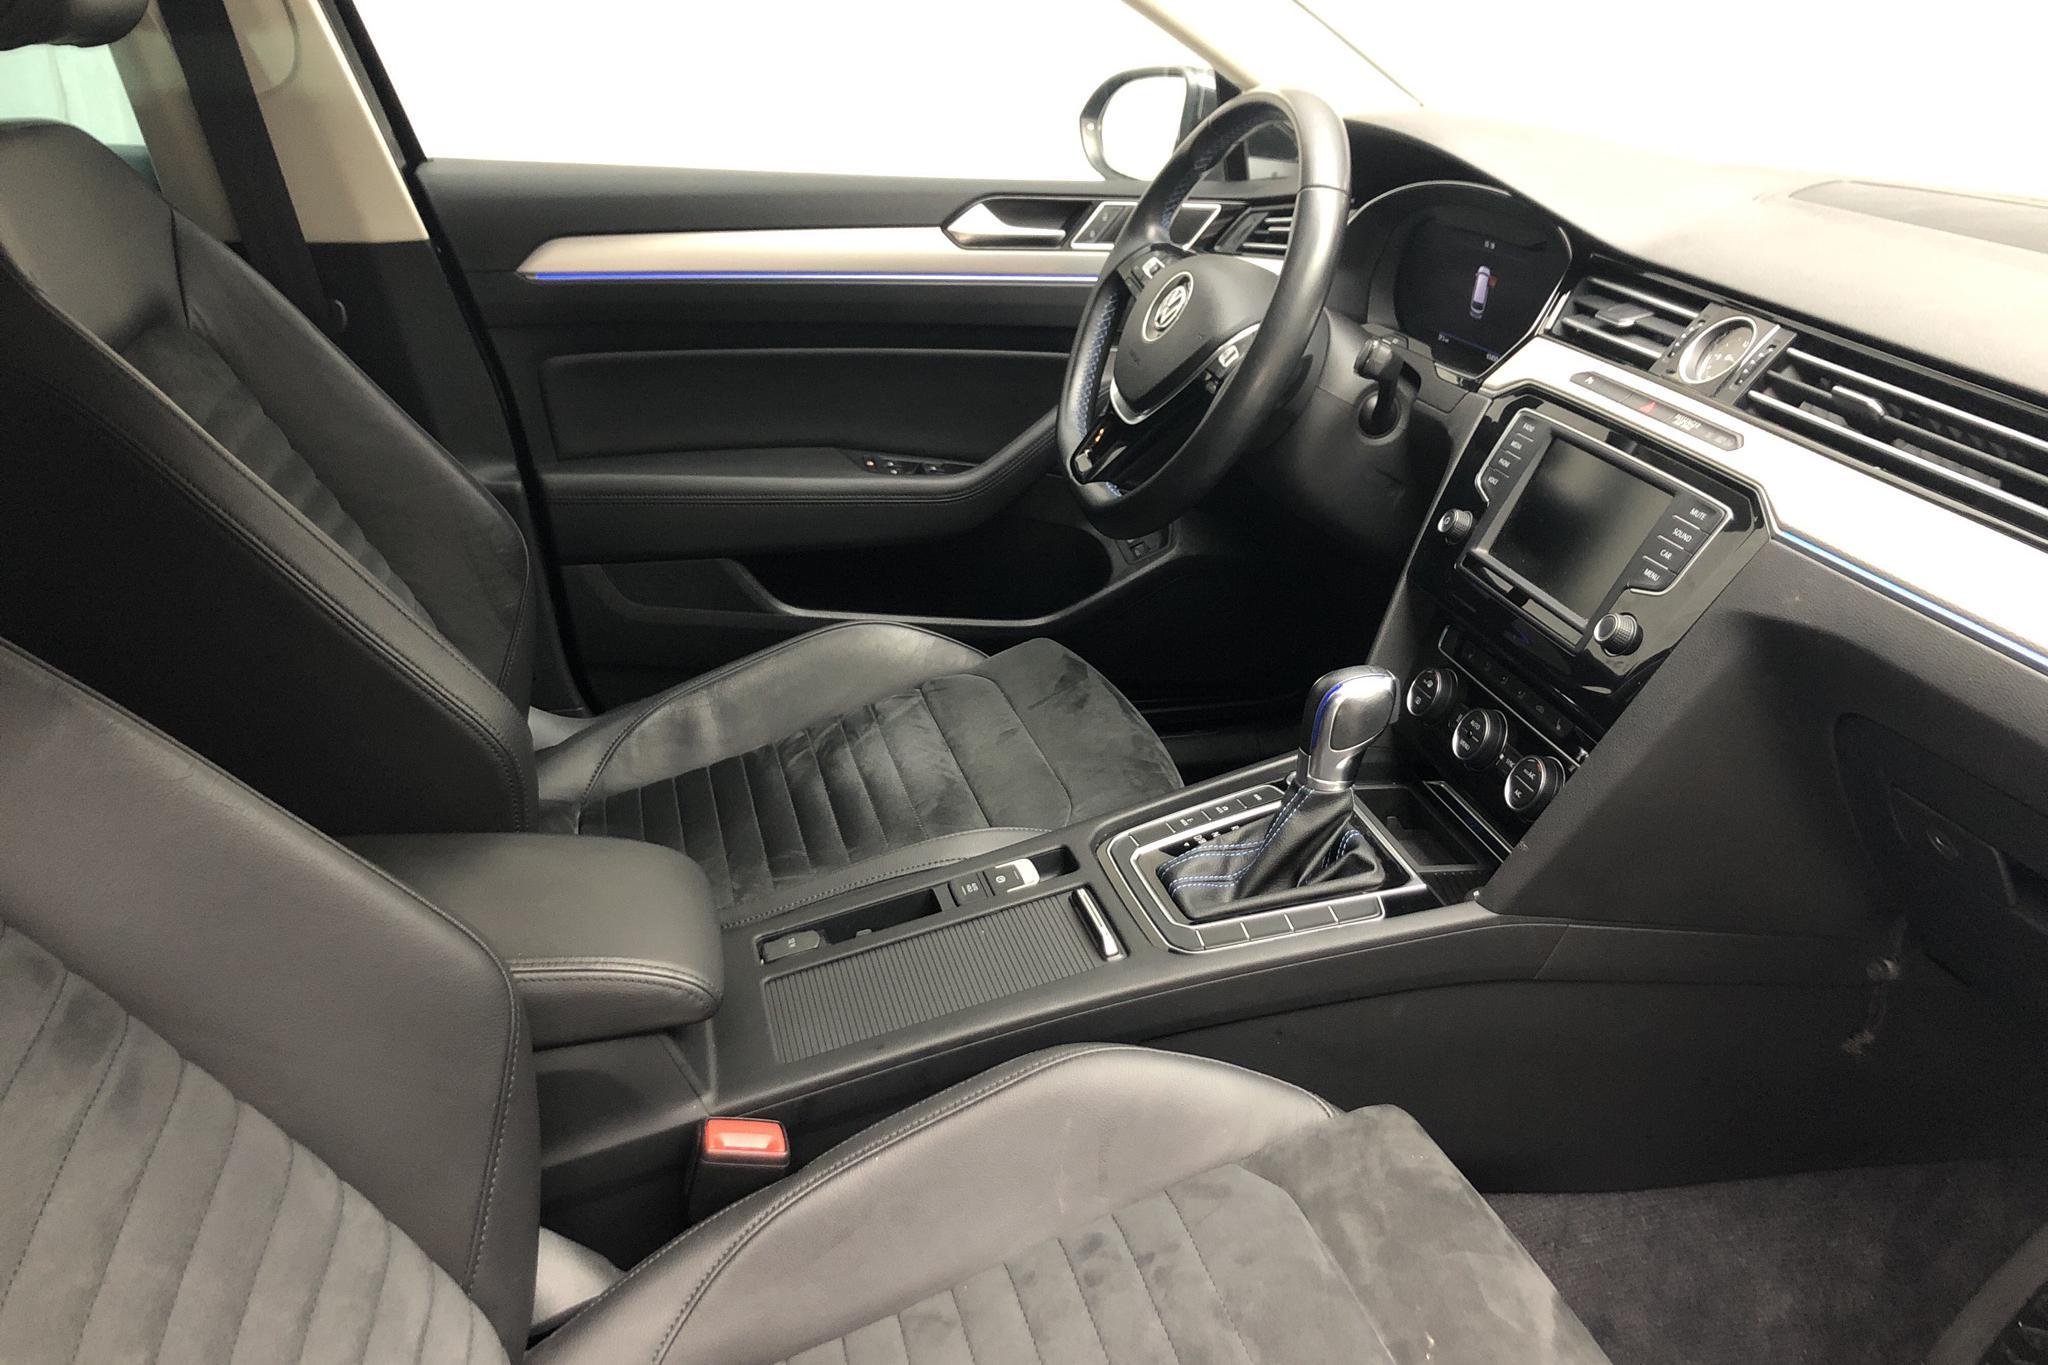 VW Passat 1.4 Plug-in-Hybrid Sportscombi (218hk) - 65 840 km - Automatic - black - 2017